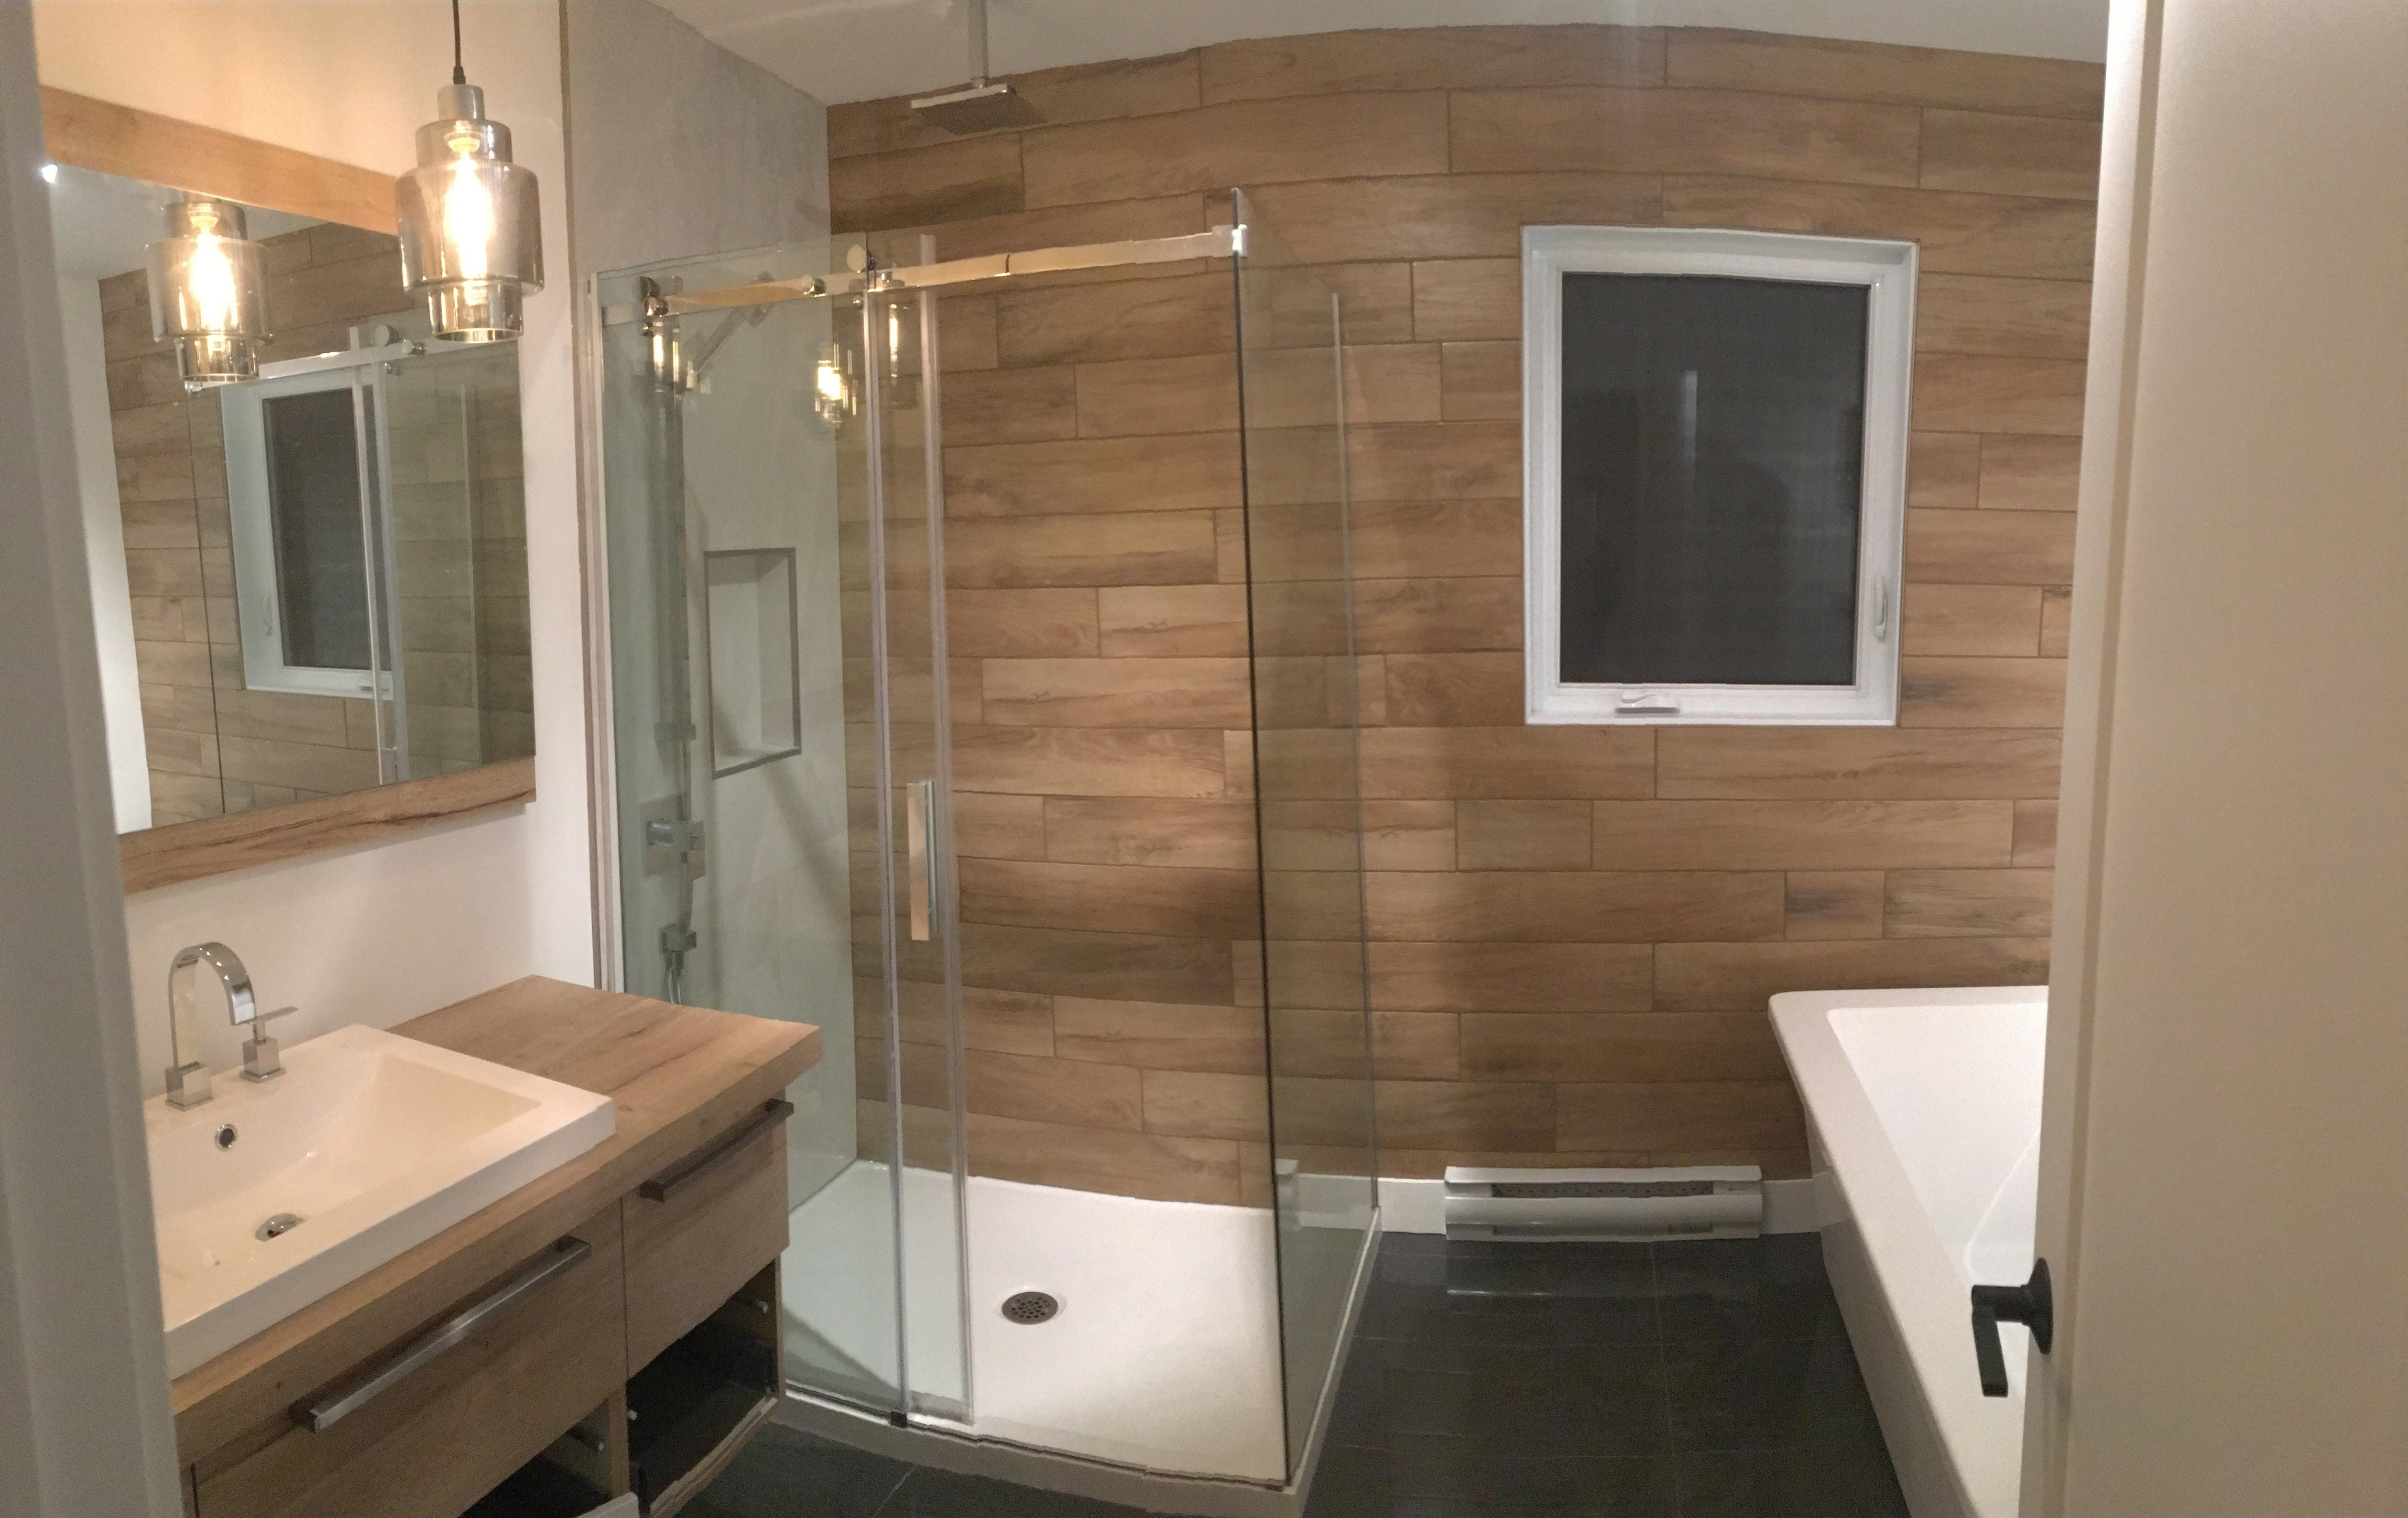 Osb Dans Salle De Bain idee deco salle de bain bois et blanc - novocom.top